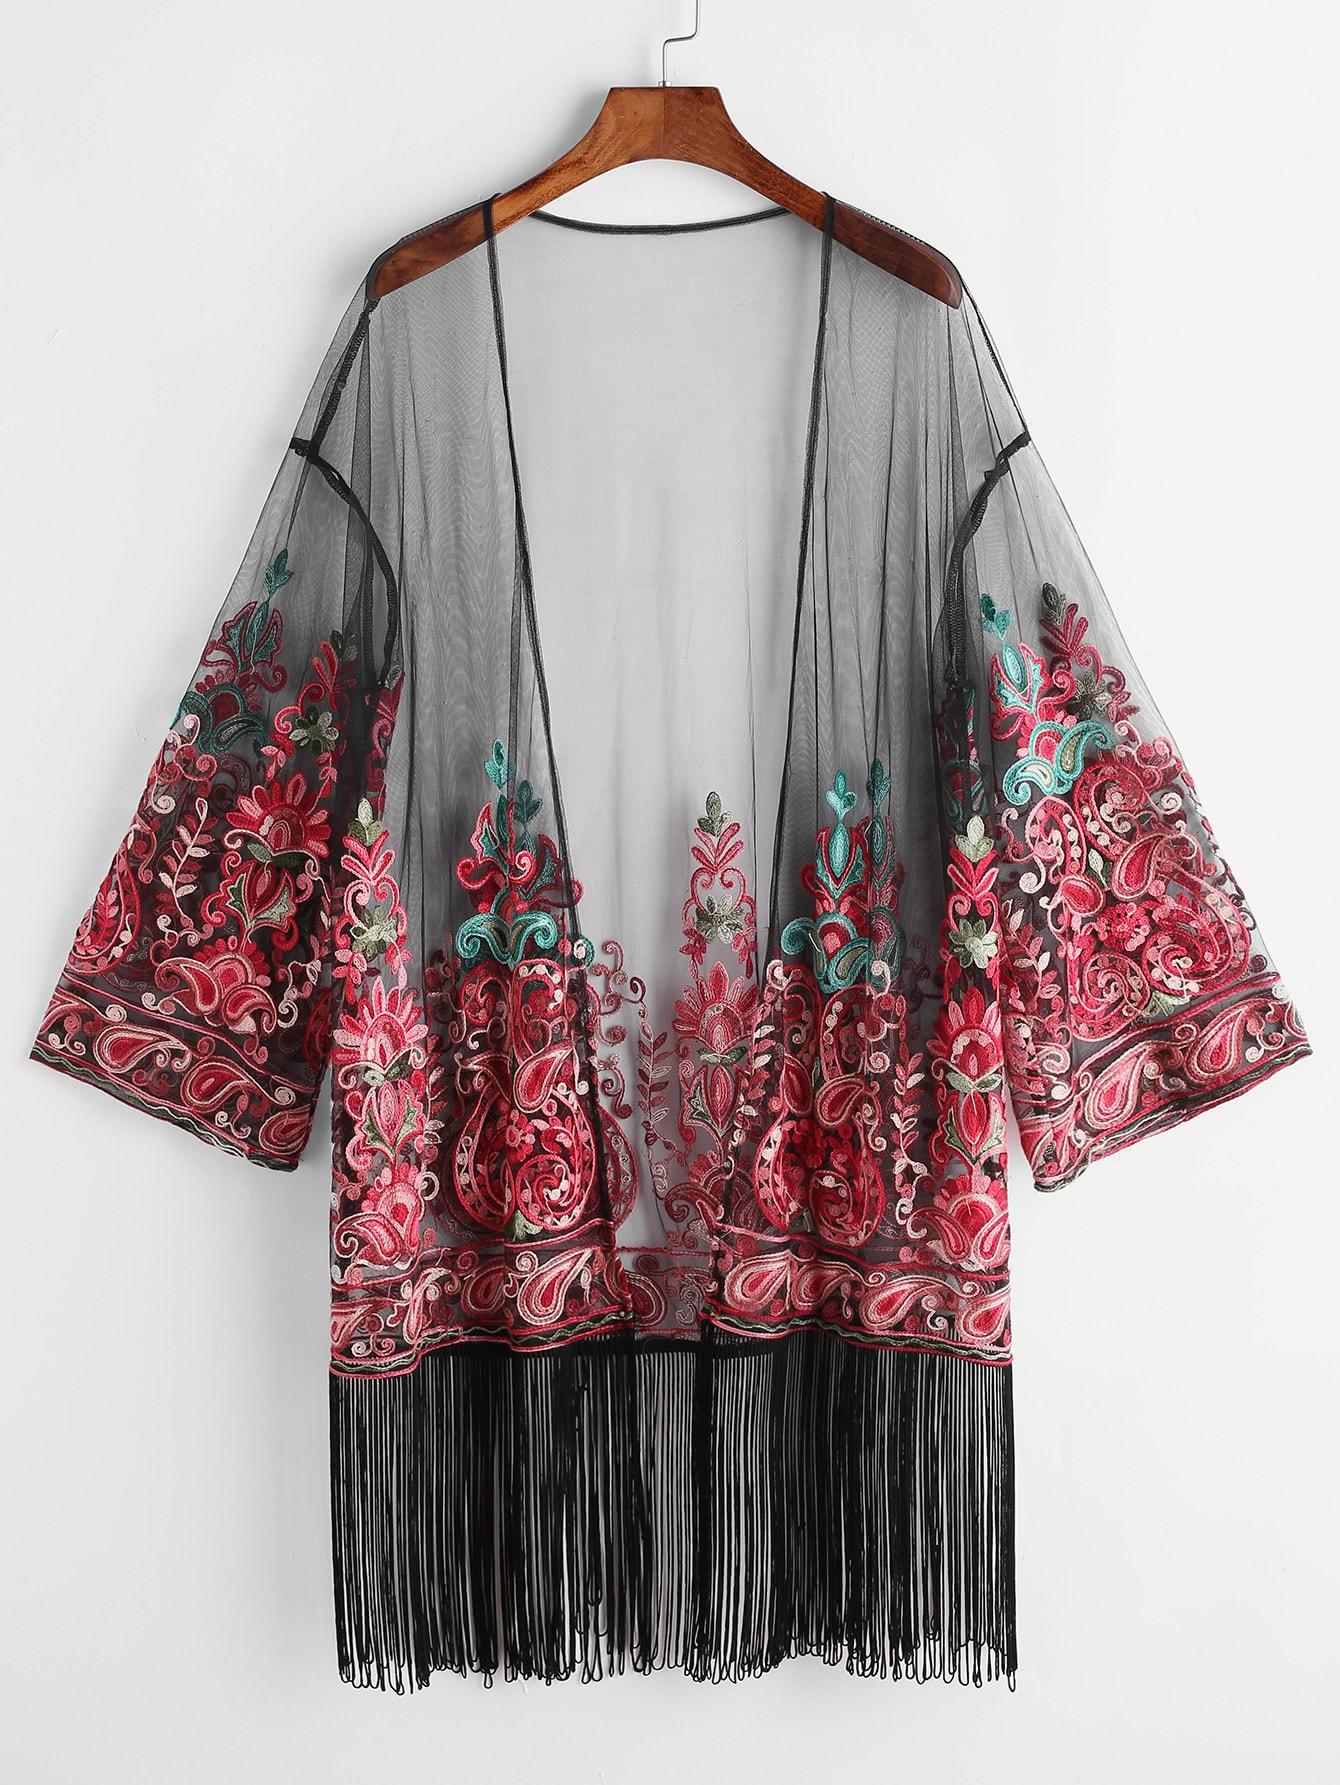 Fringe Trim Paisley Embroidered Mesh Kimono paisley print fringe trim kimono